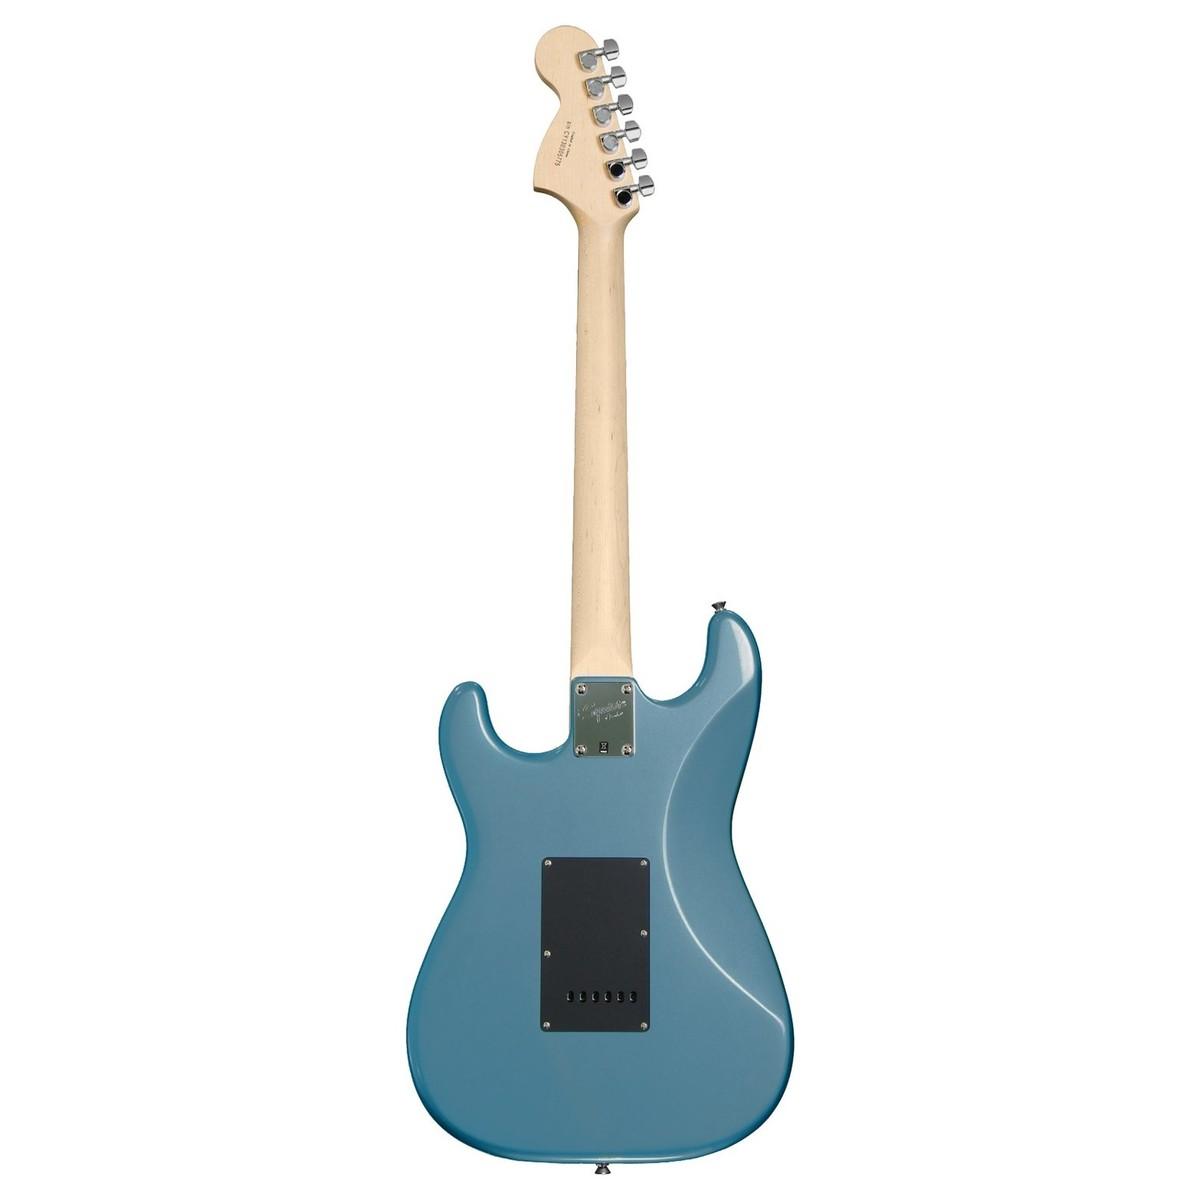 disc squier by fender affinity stratocaster hss lake placid blue at gear4music. Black Bedroom Furniture Sets. Home Design Ideas